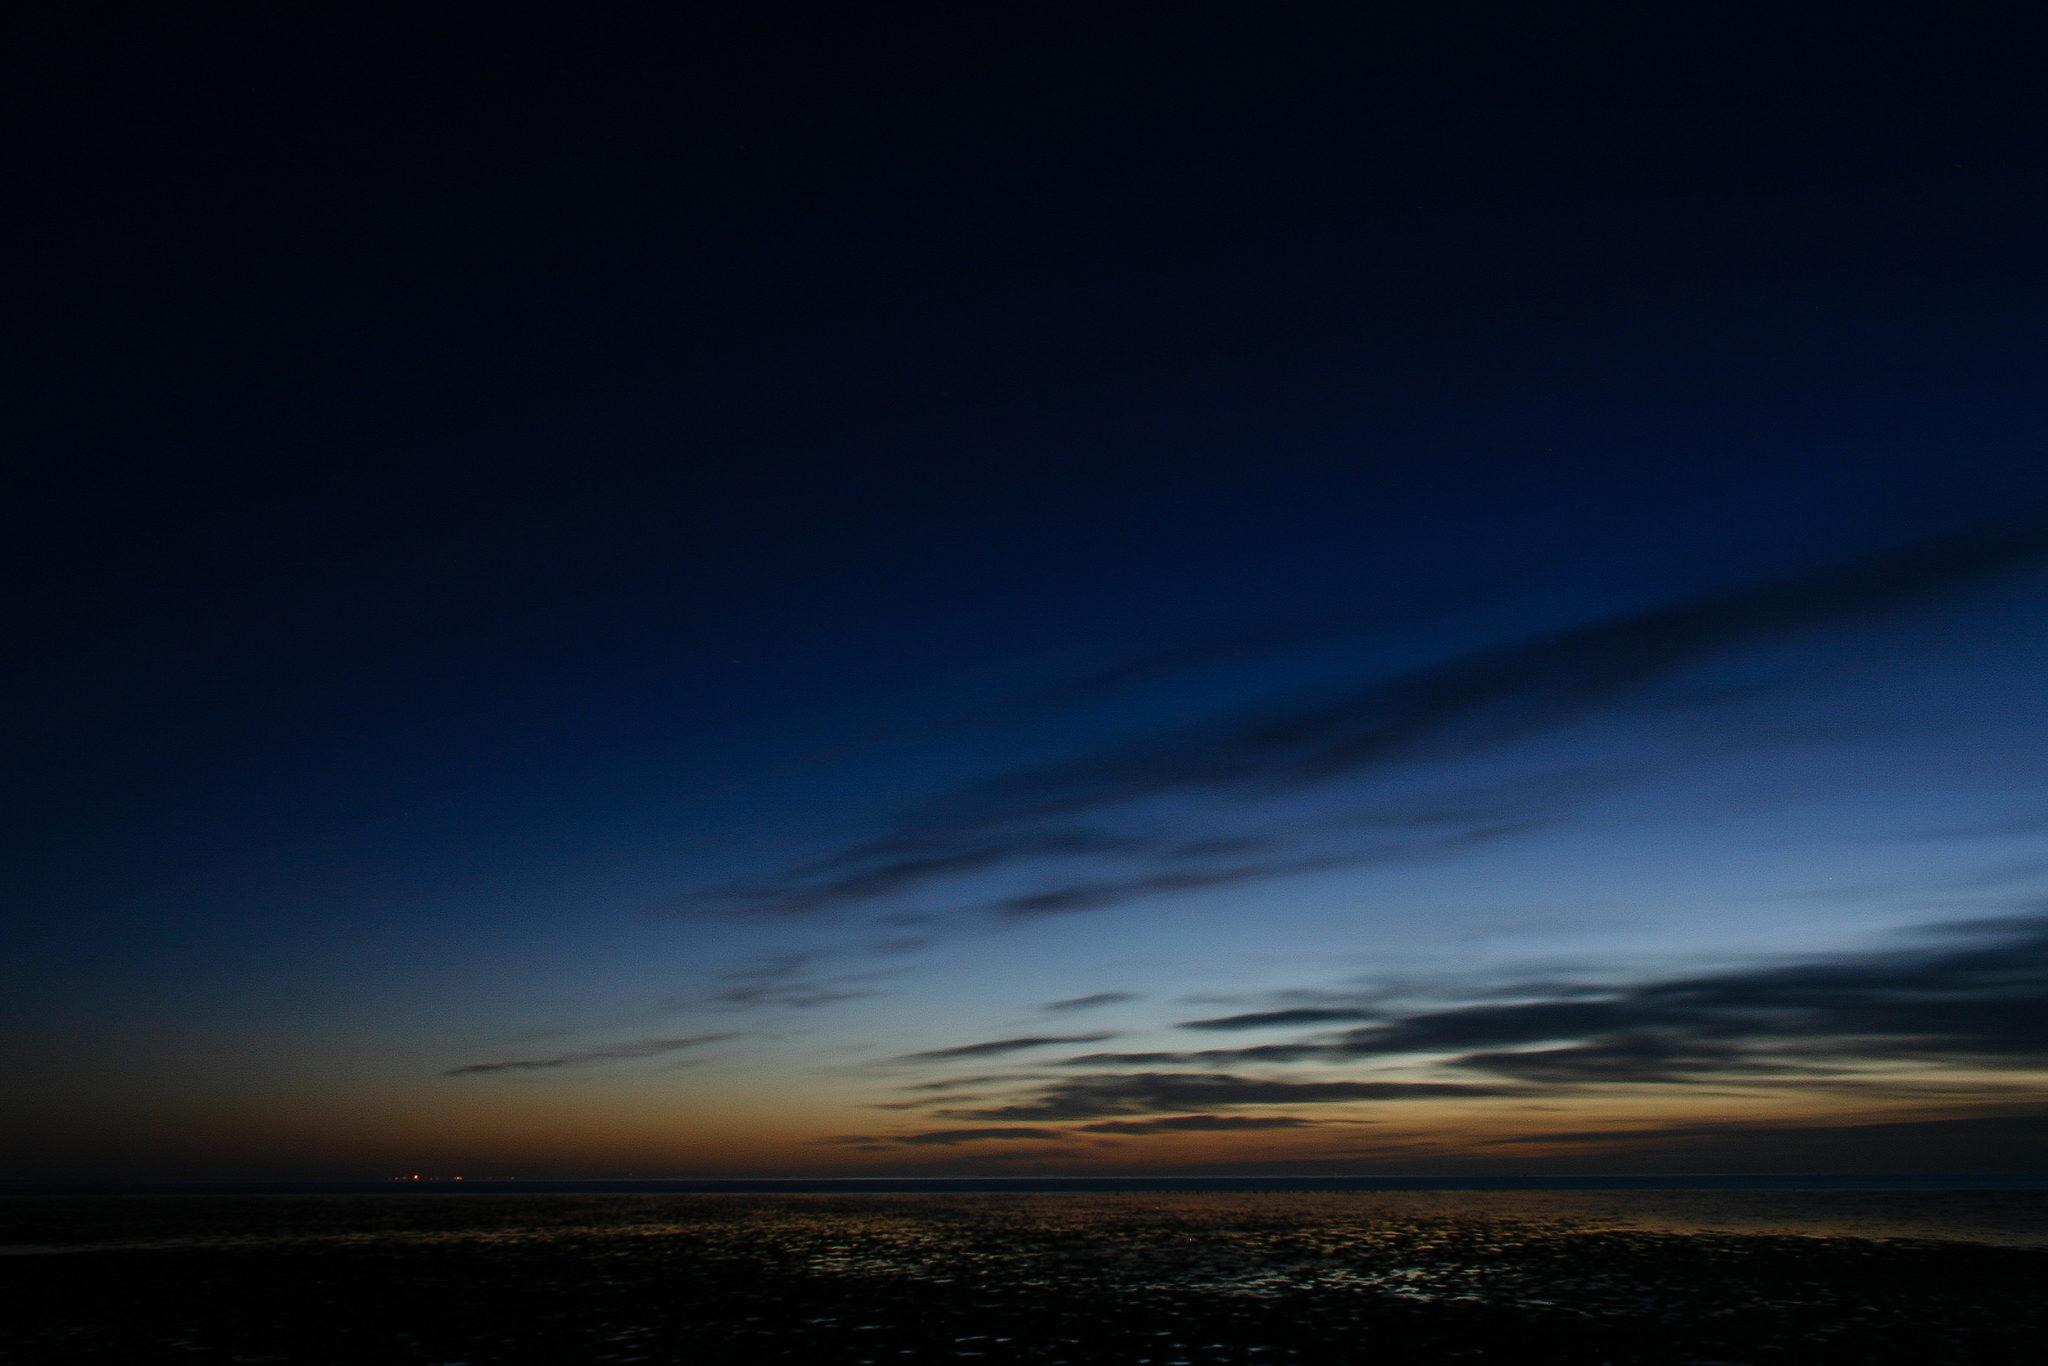 Blaue Stunden im Wattenmeer